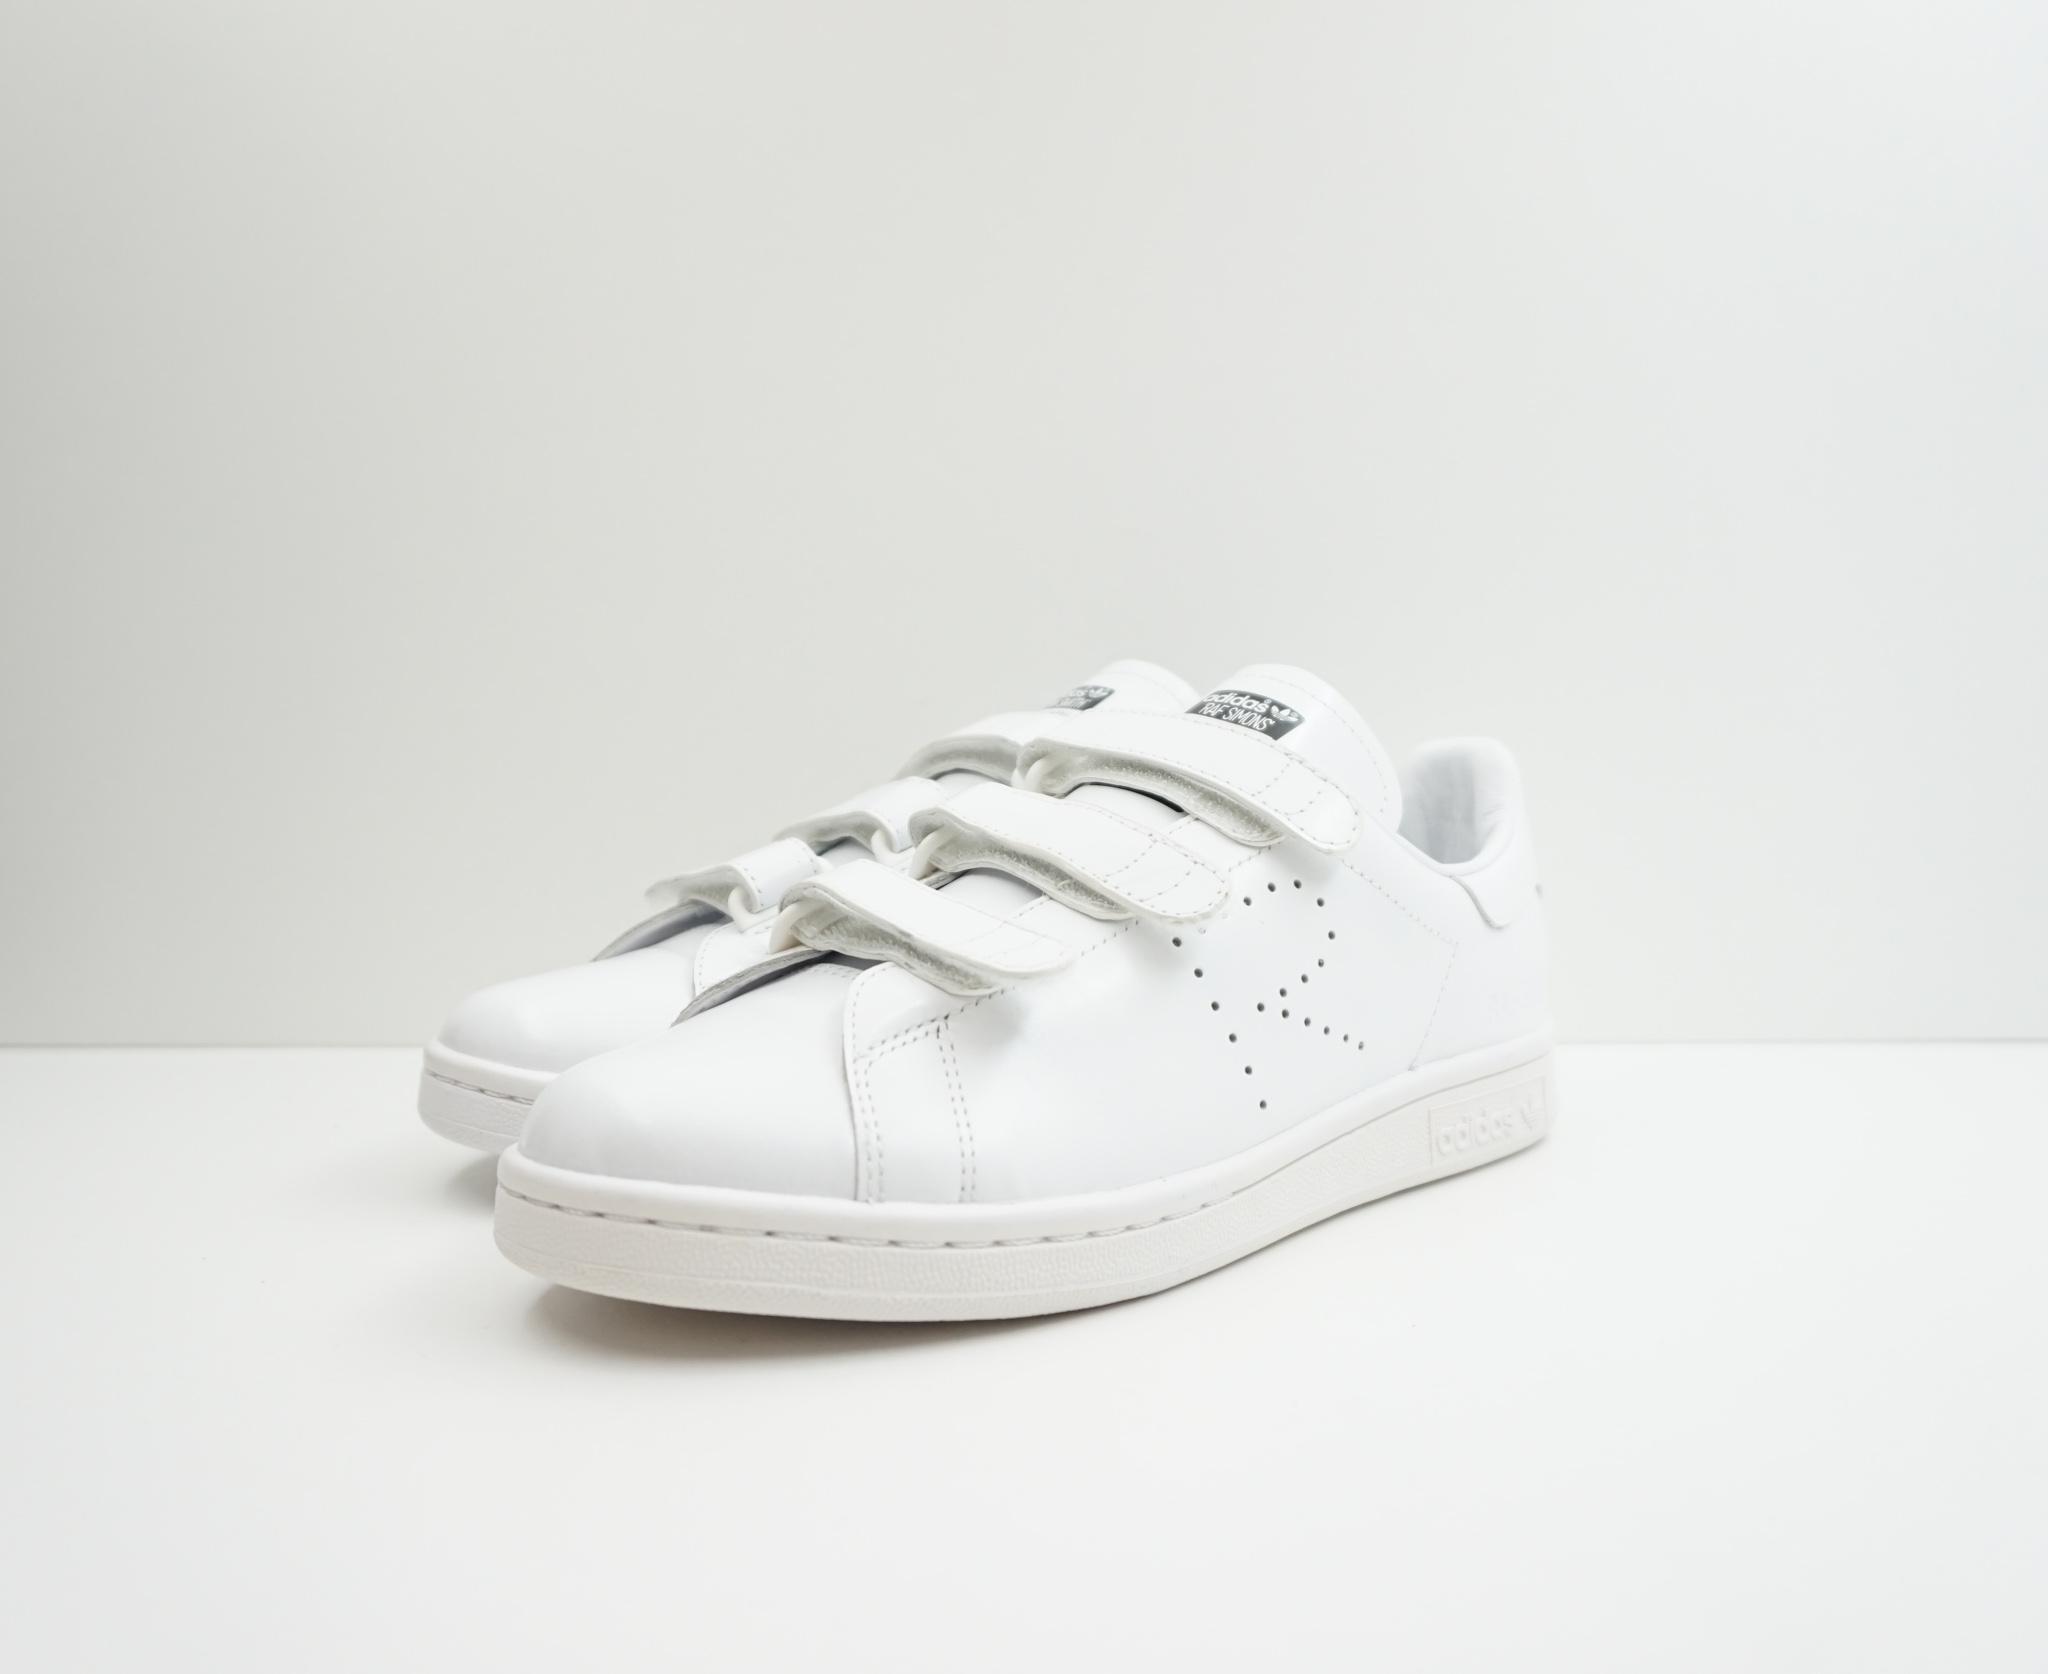 Adidas Stan Smith x Raf Simons Comfort White